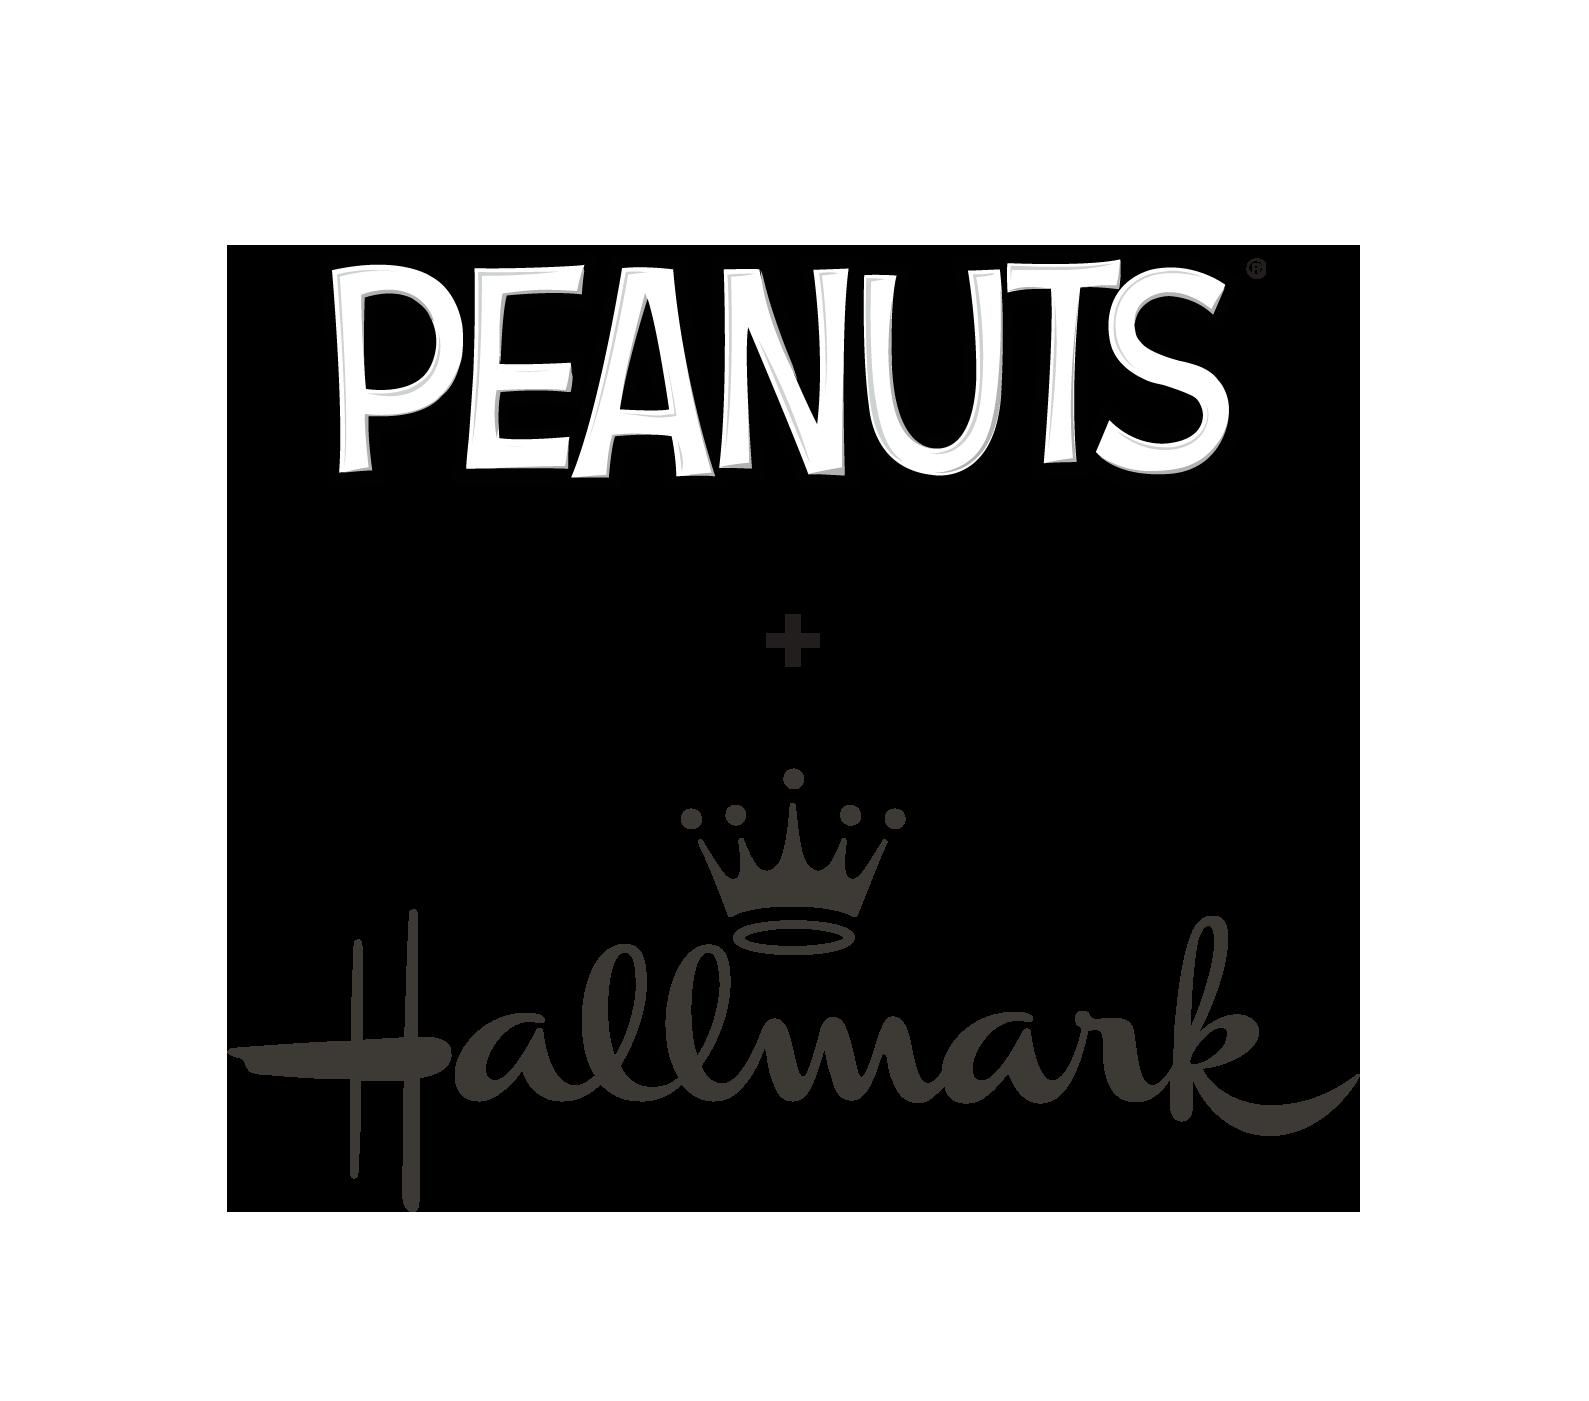 hallmark_and_peanuts_portrait